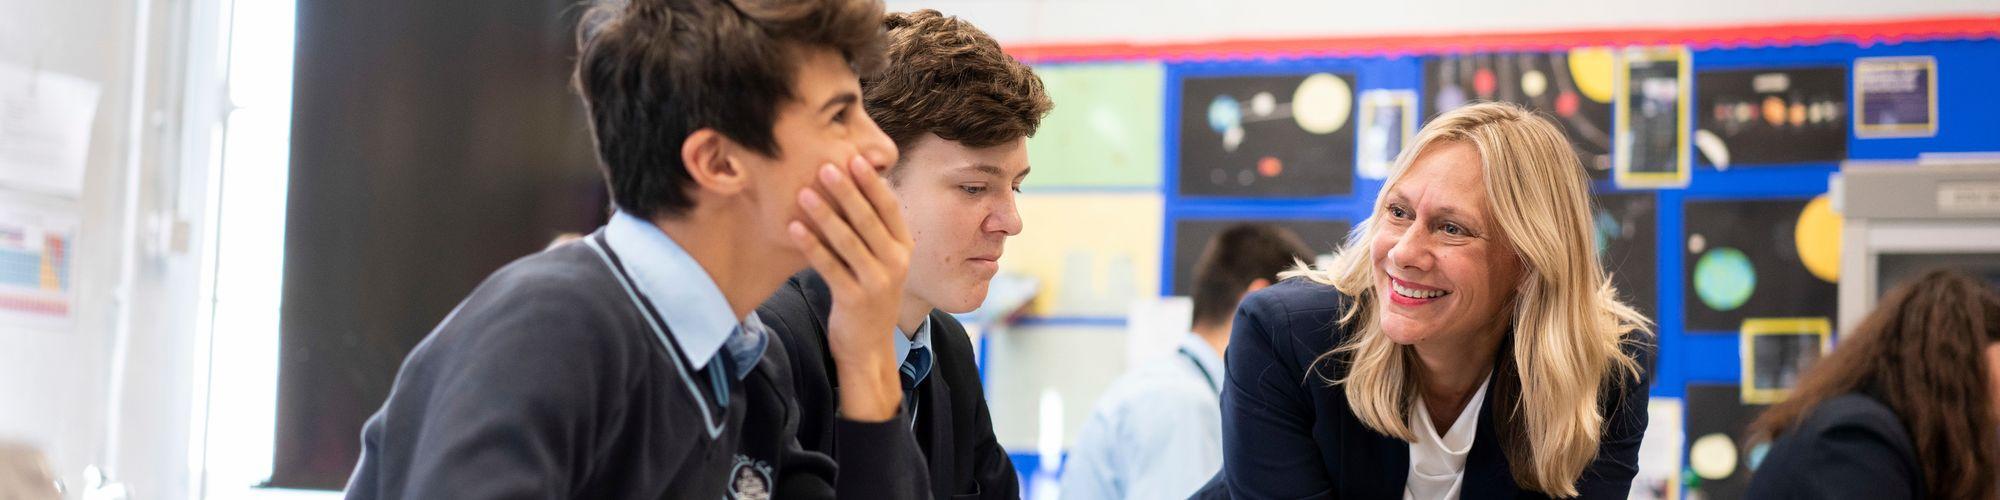 18 11 08.Chiswick School.1318